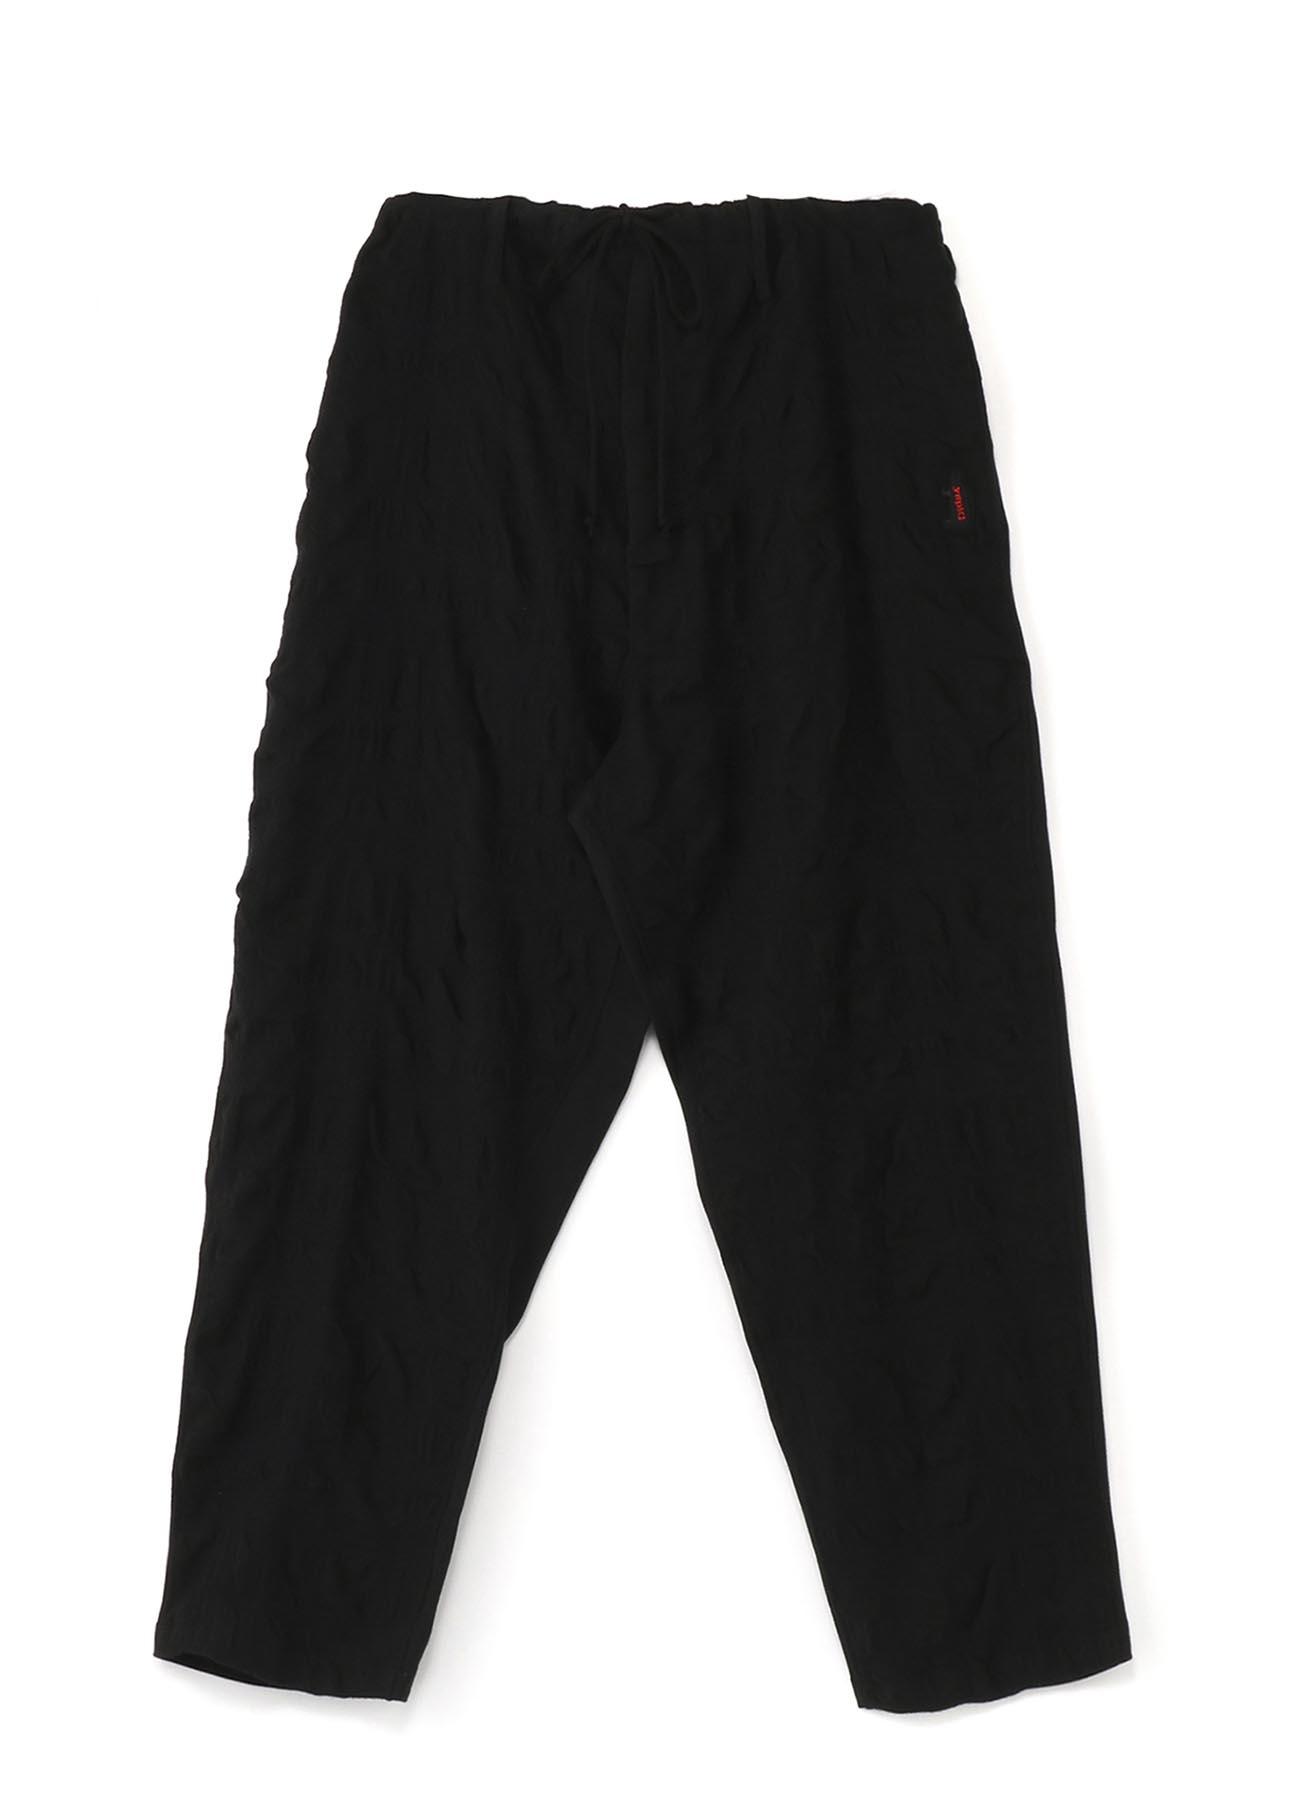 Gipsy 褶皱面料 × 纯棉面料收口裤